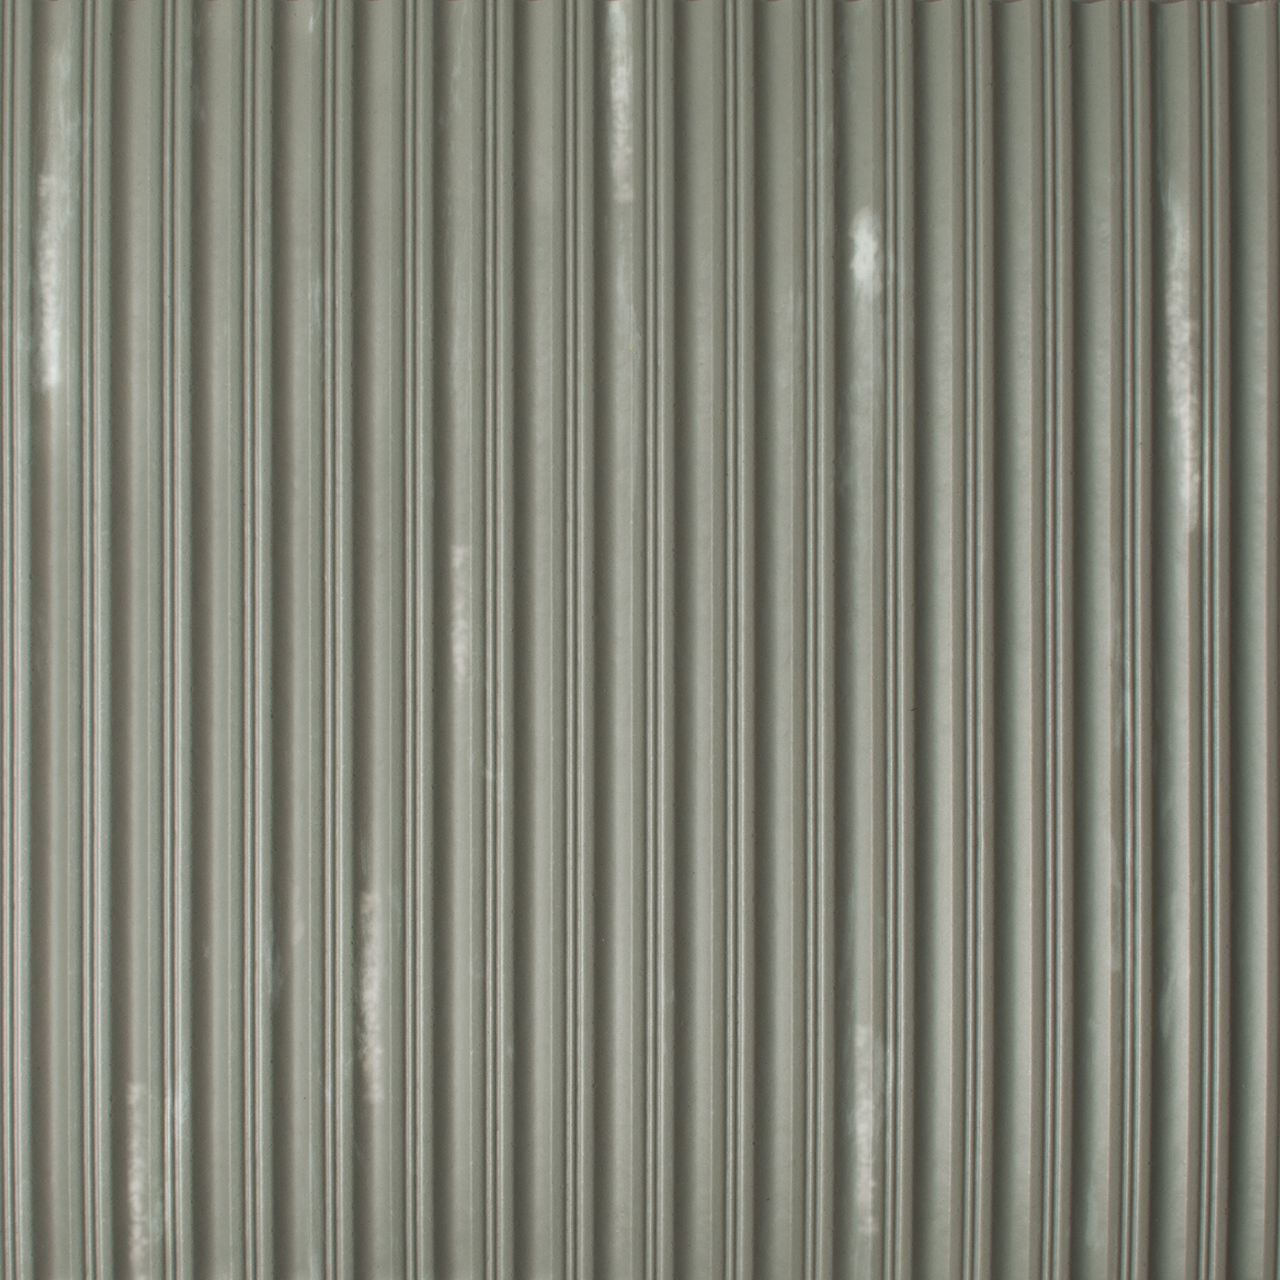 Drainage Matting | Ribbed Mat | Flat Rib Gray